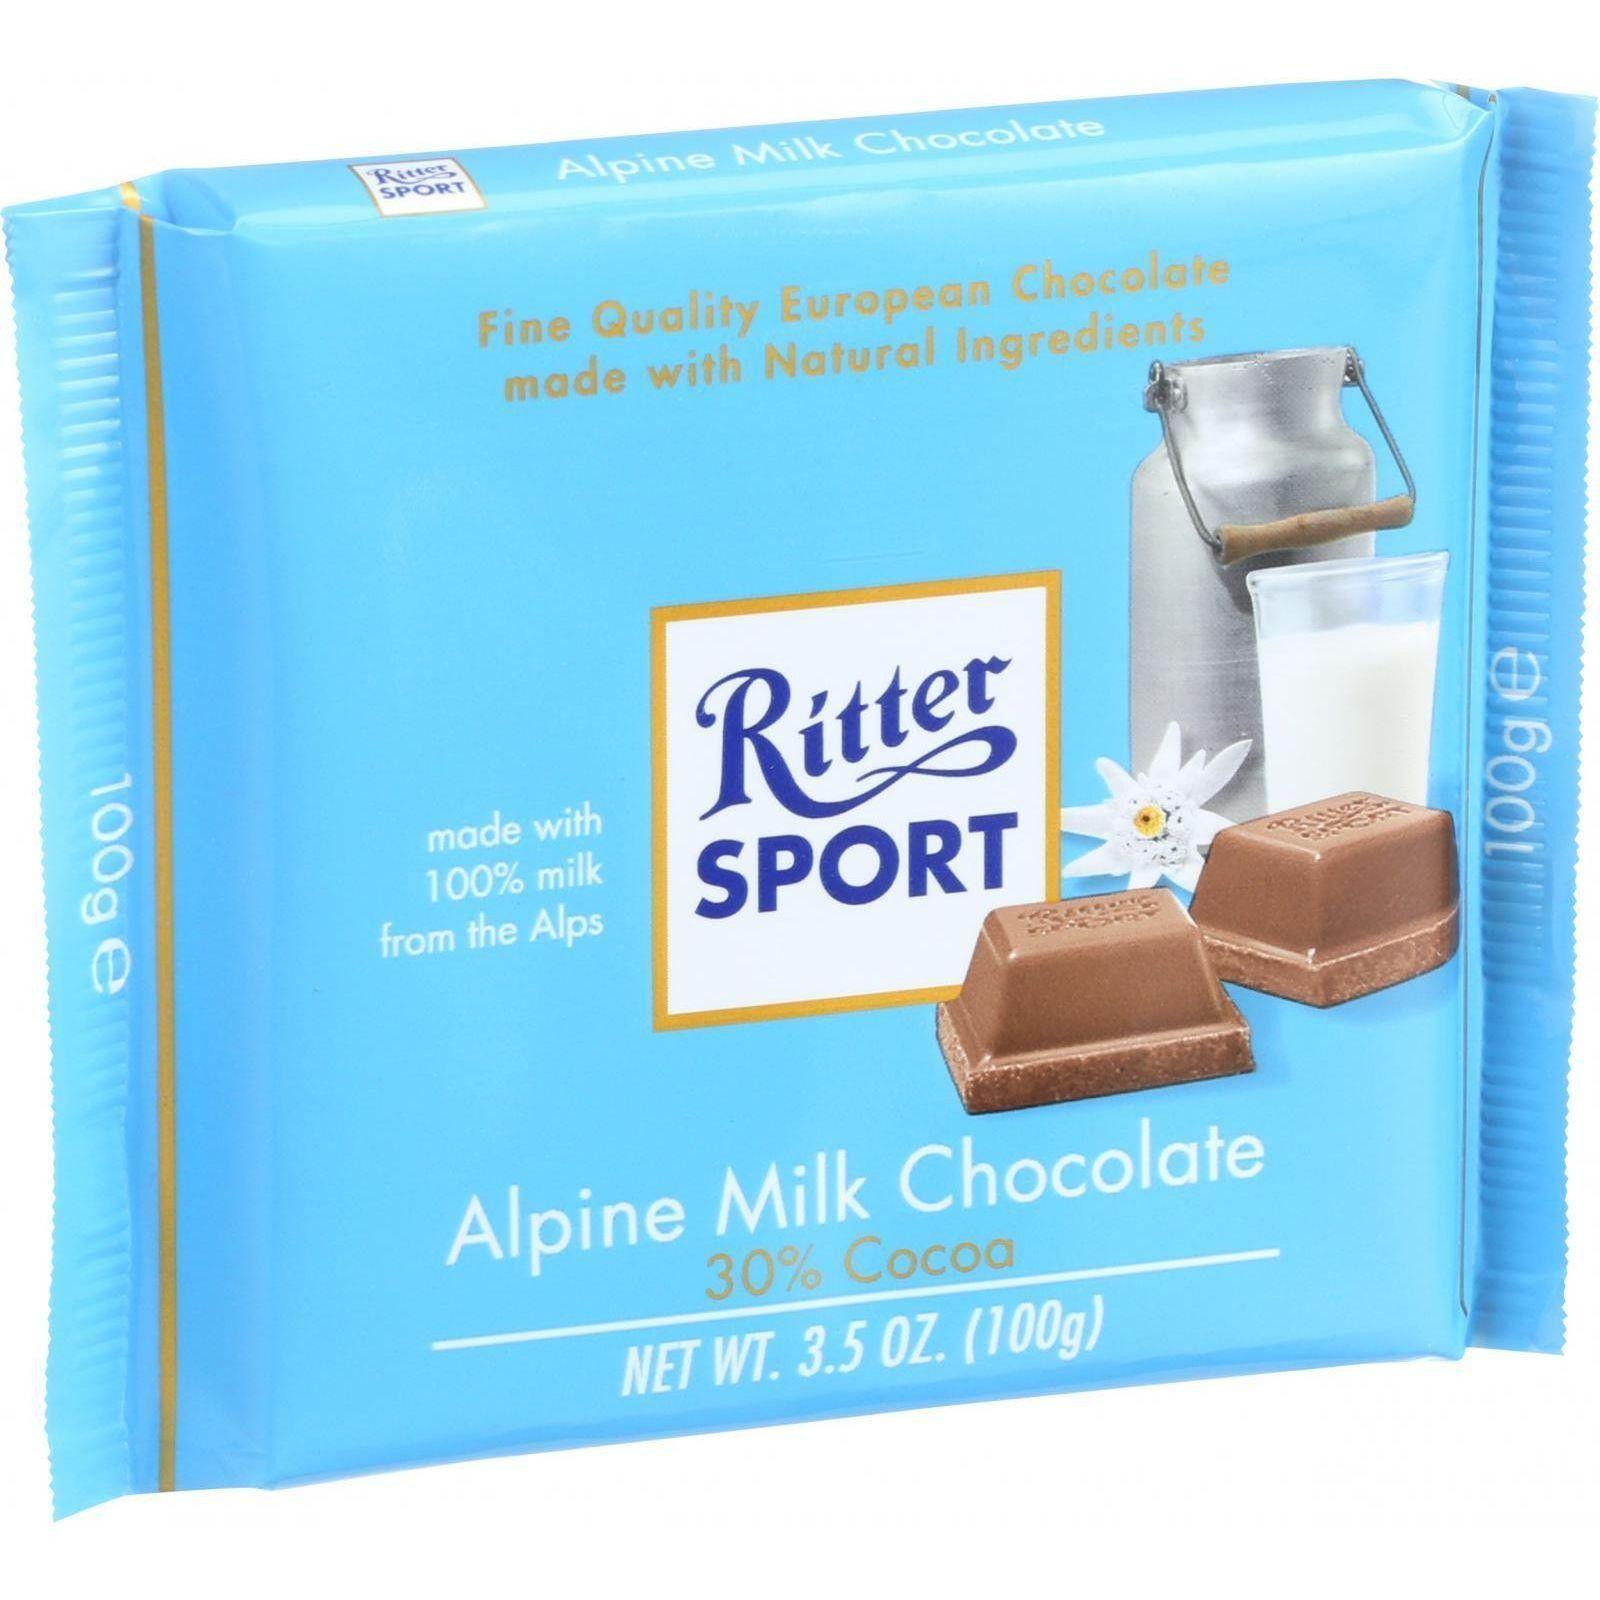 Ritter Sport Chocolate Bar Milk Chocolate 30 Percent